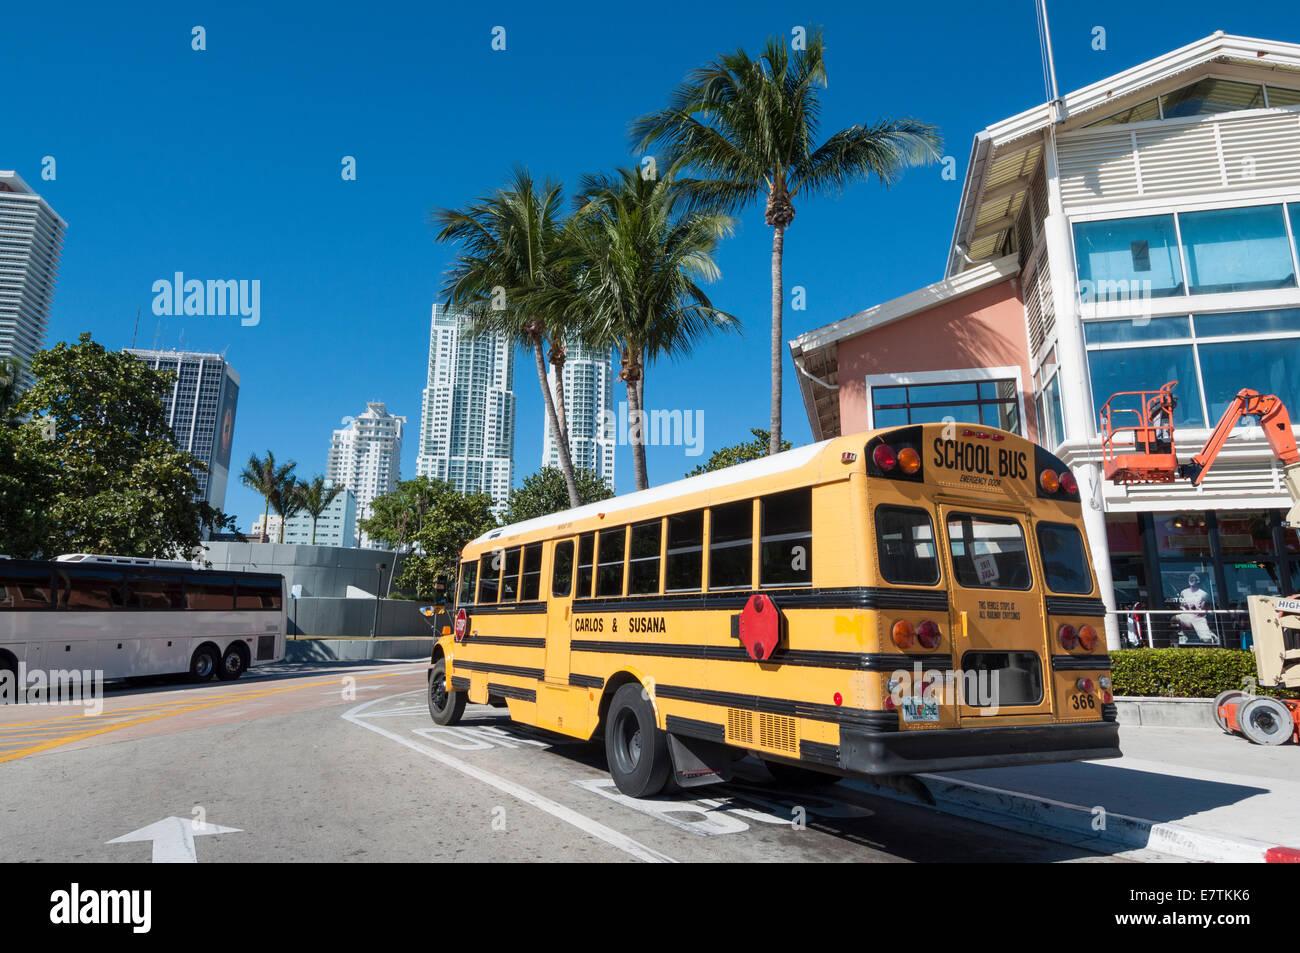 Yellow school bus in Miami, Florida, USA - Stock Image